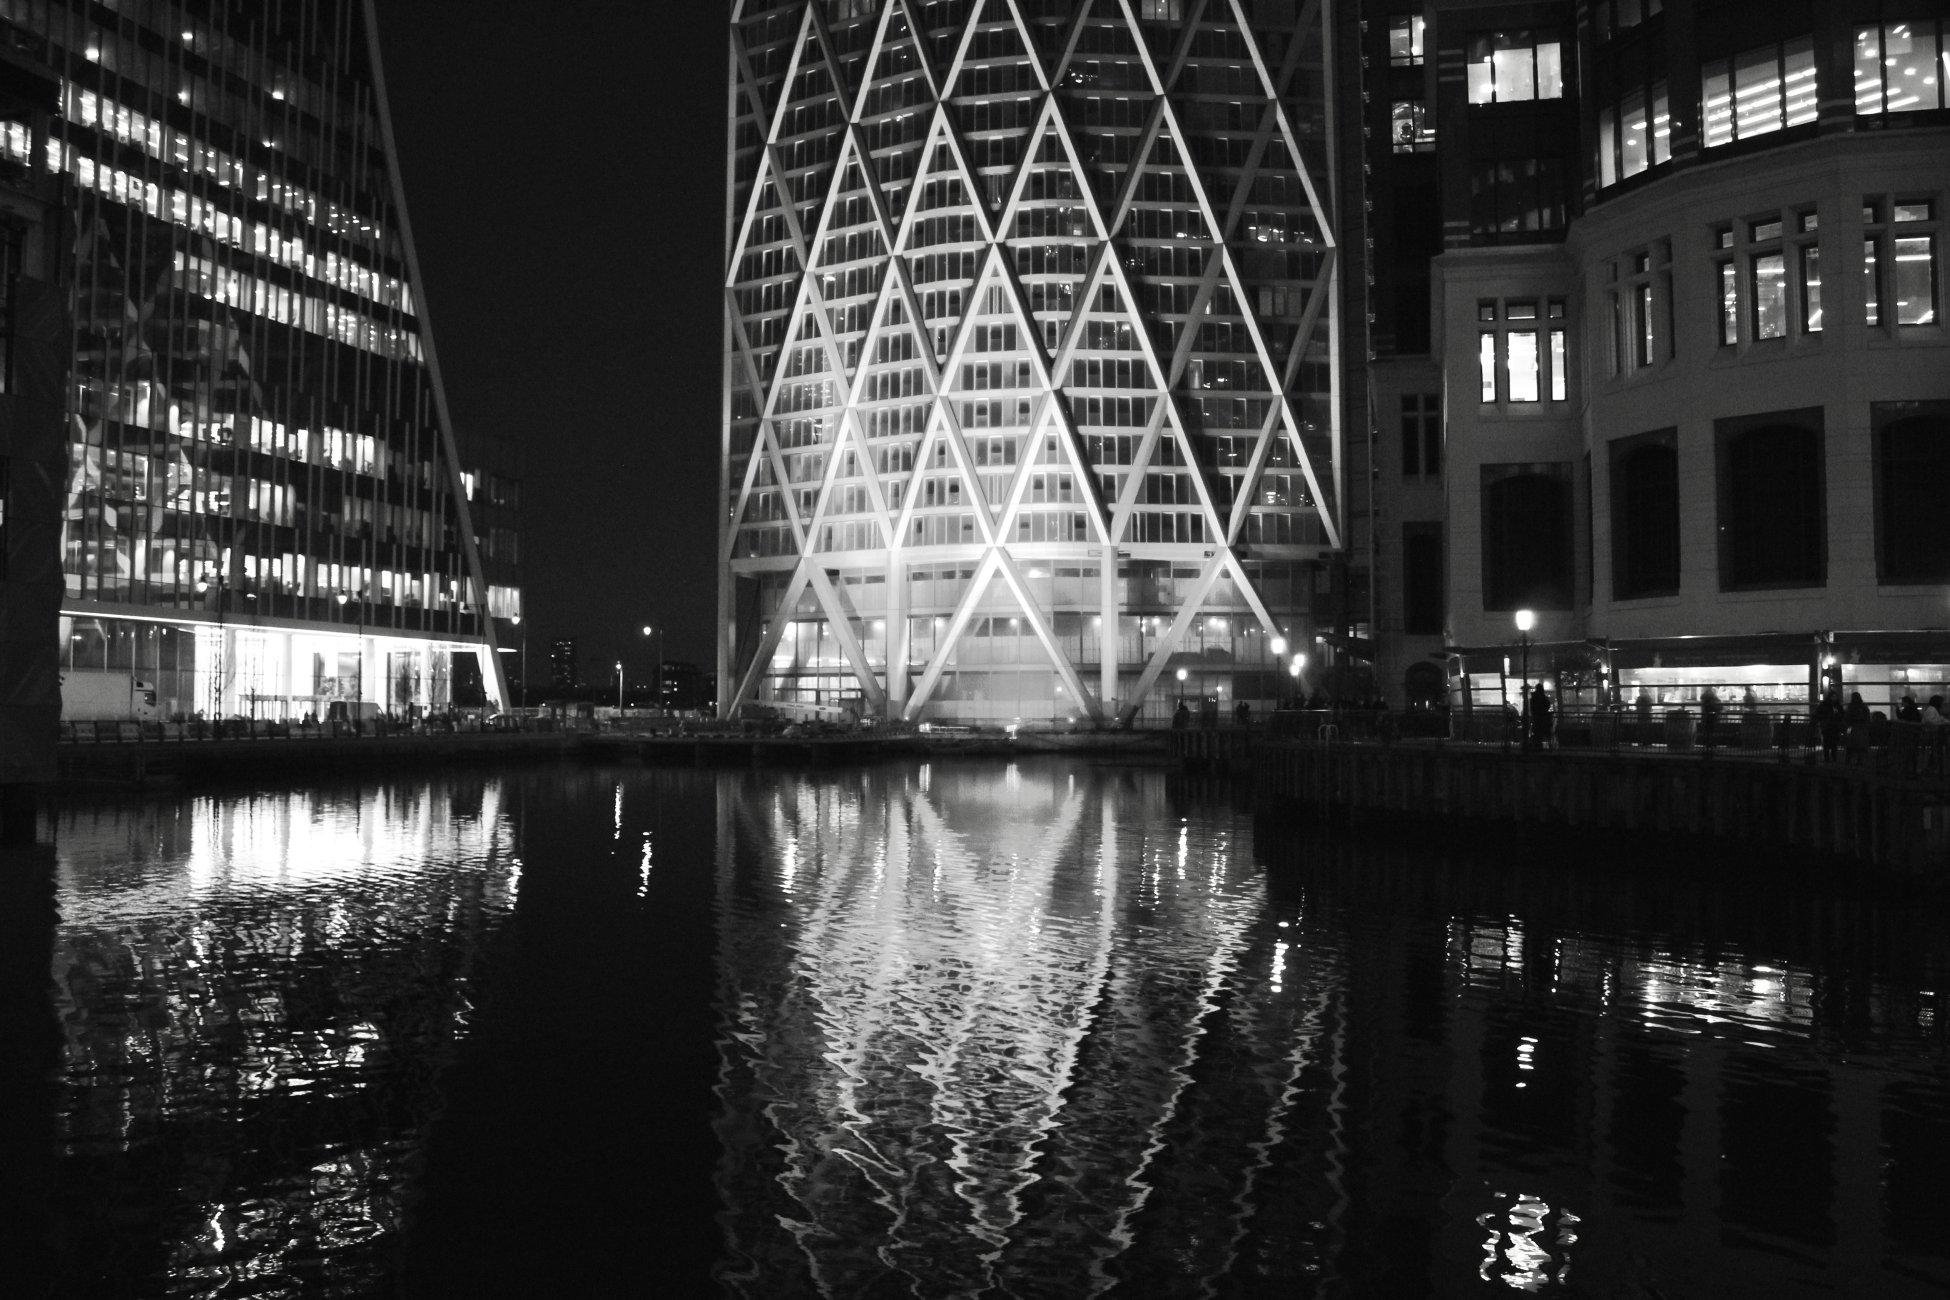 Reflecting in black n white